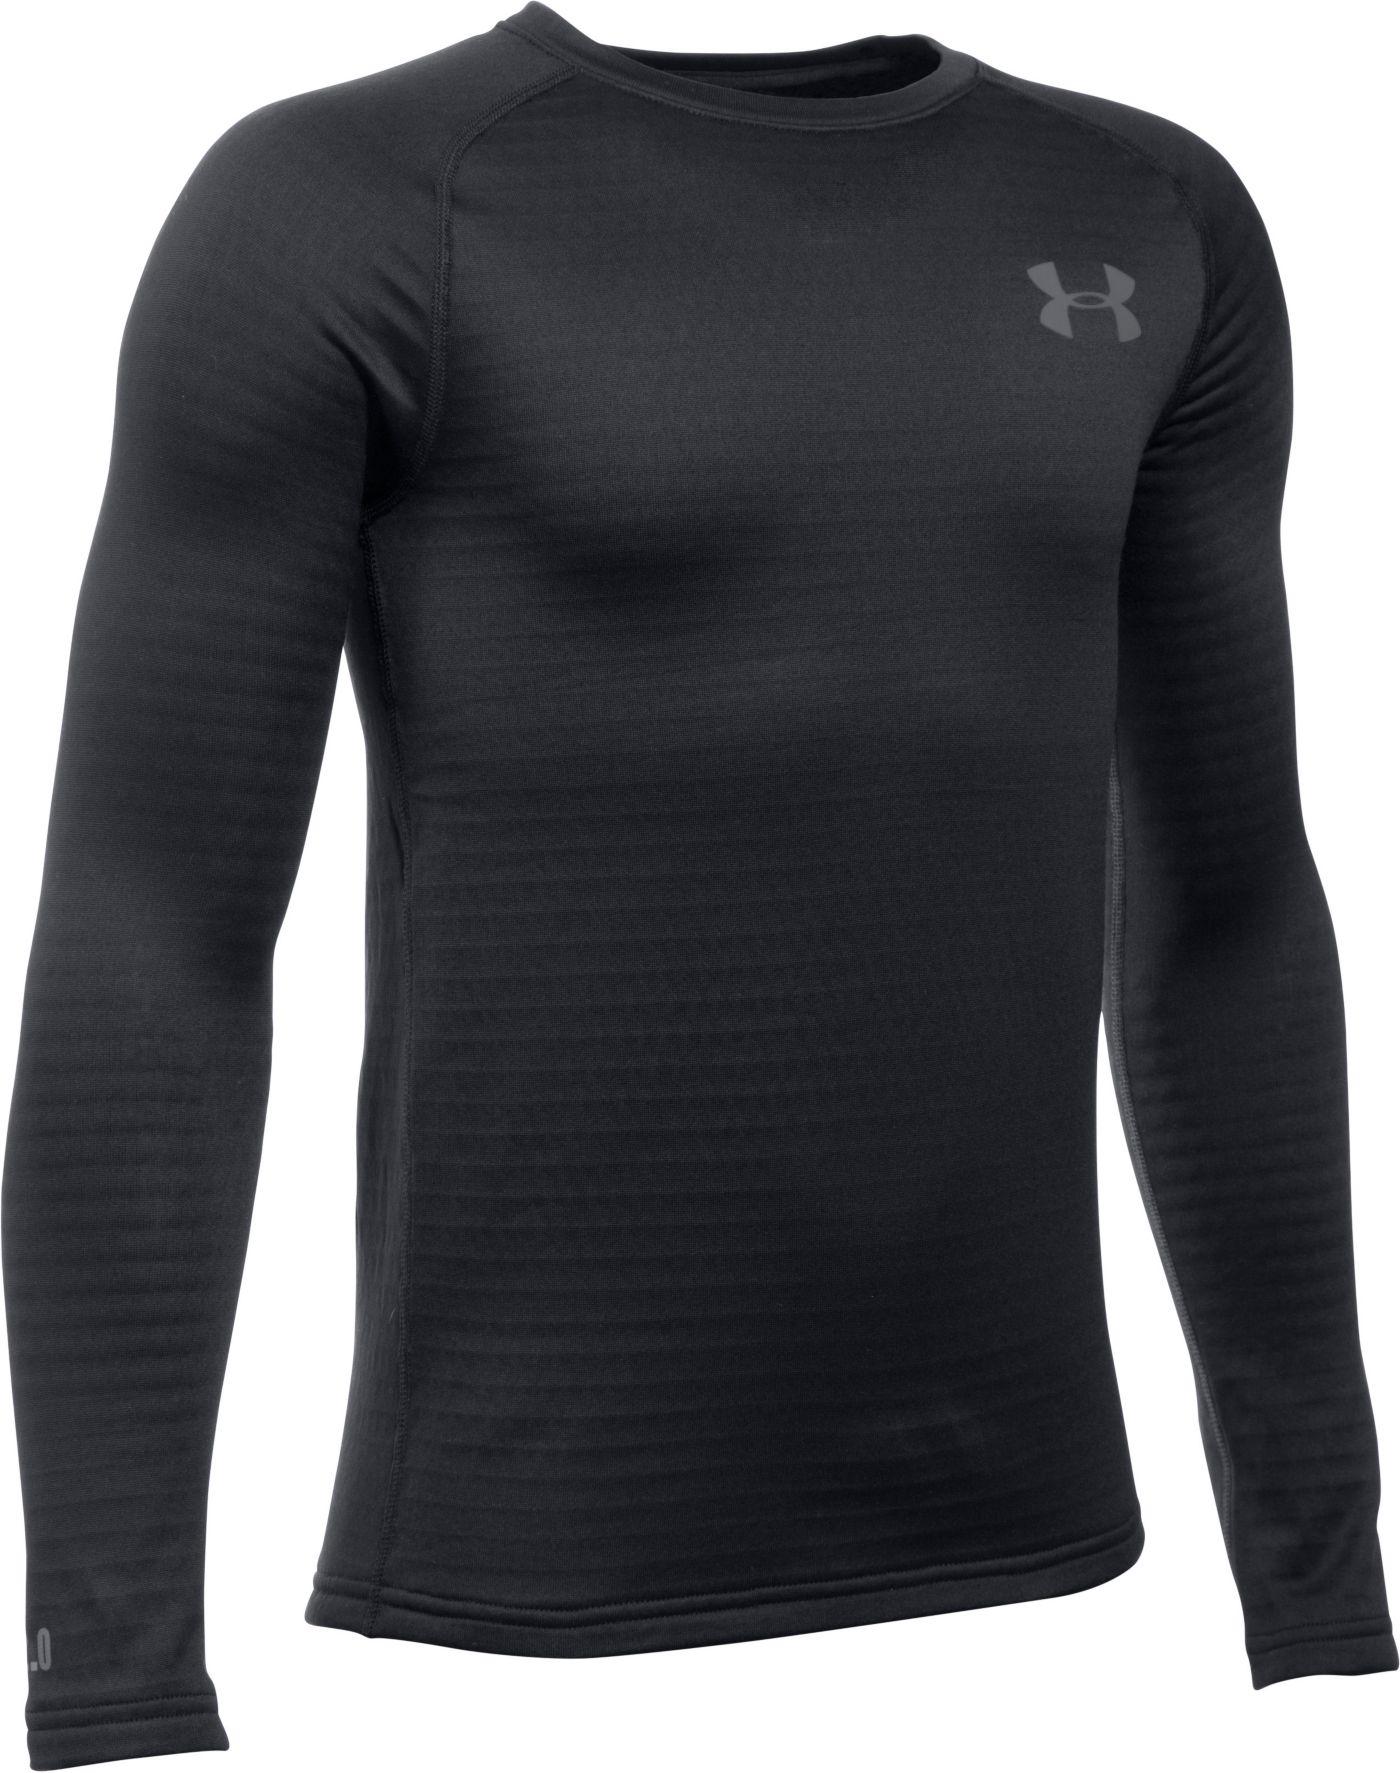 Under Armour Youth Base 2.0 Crew Long Sleeve Shirt